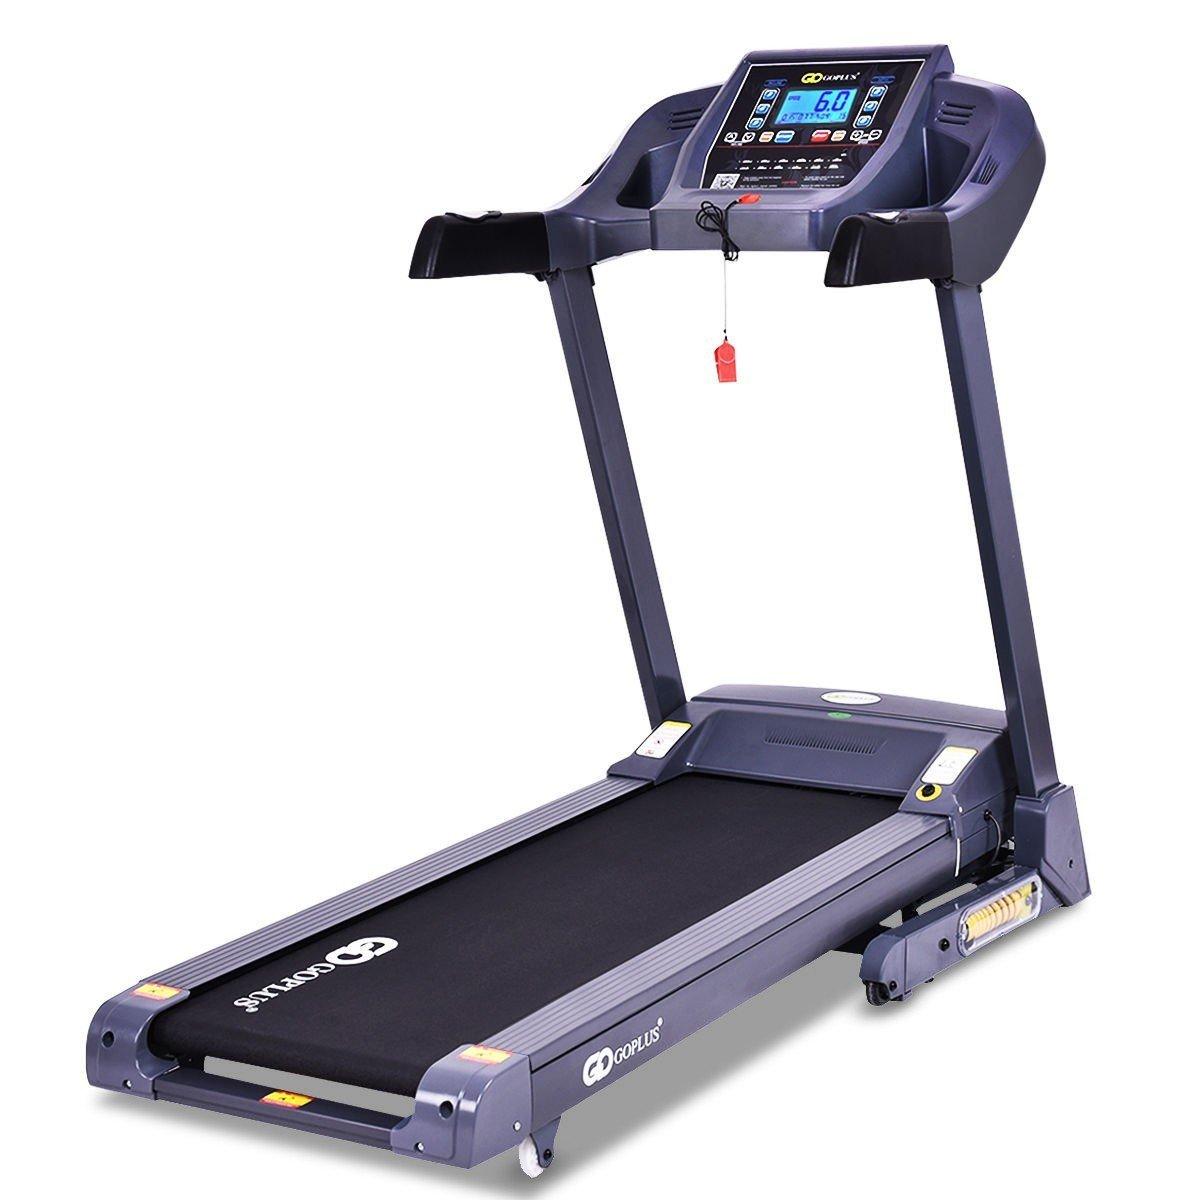 2.5 HP Folding Electric Treadmill by Apontus